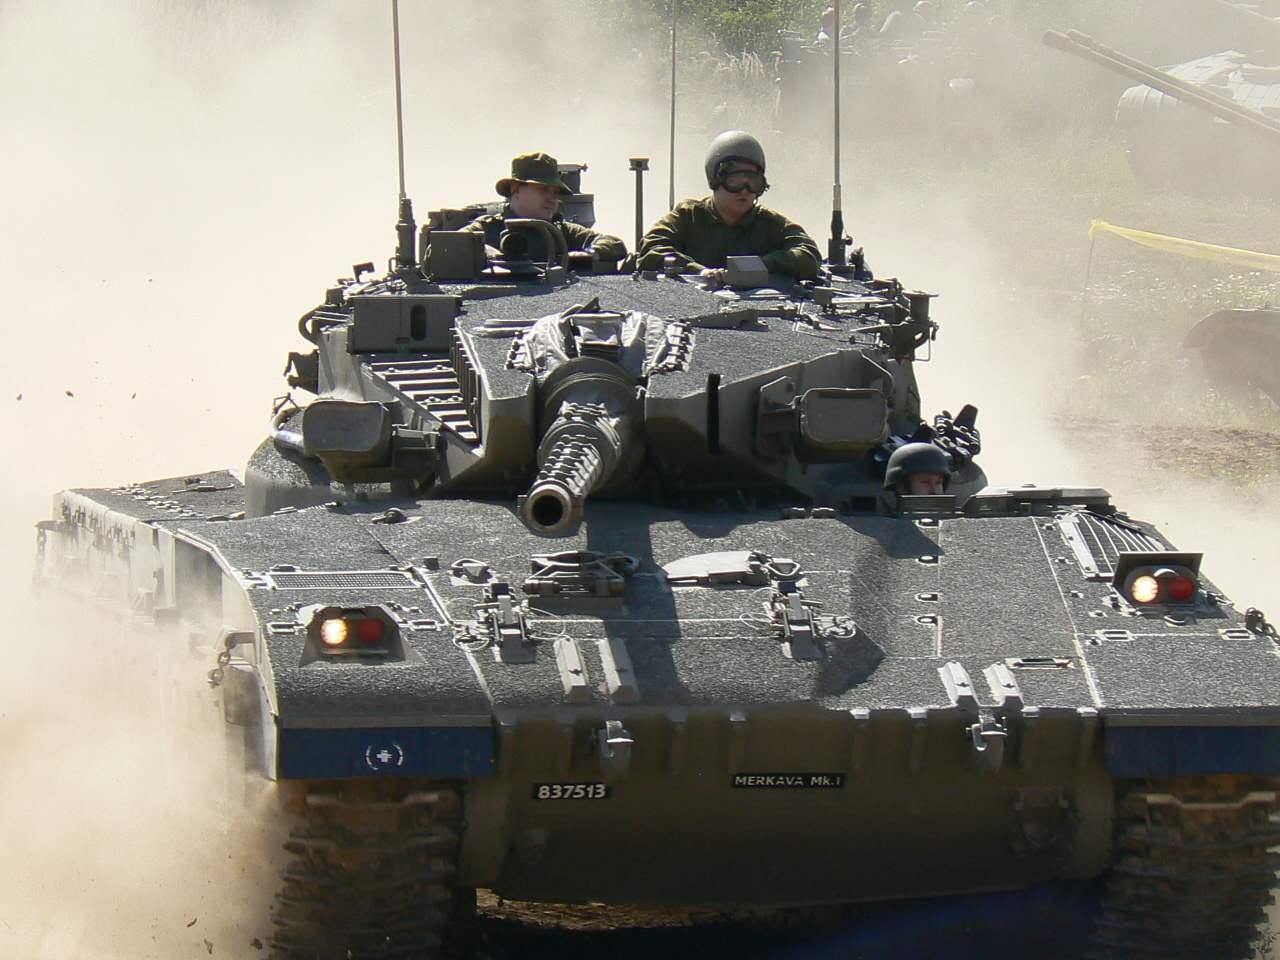 MERKAVA TANK OF THE ISRAELI ARMY